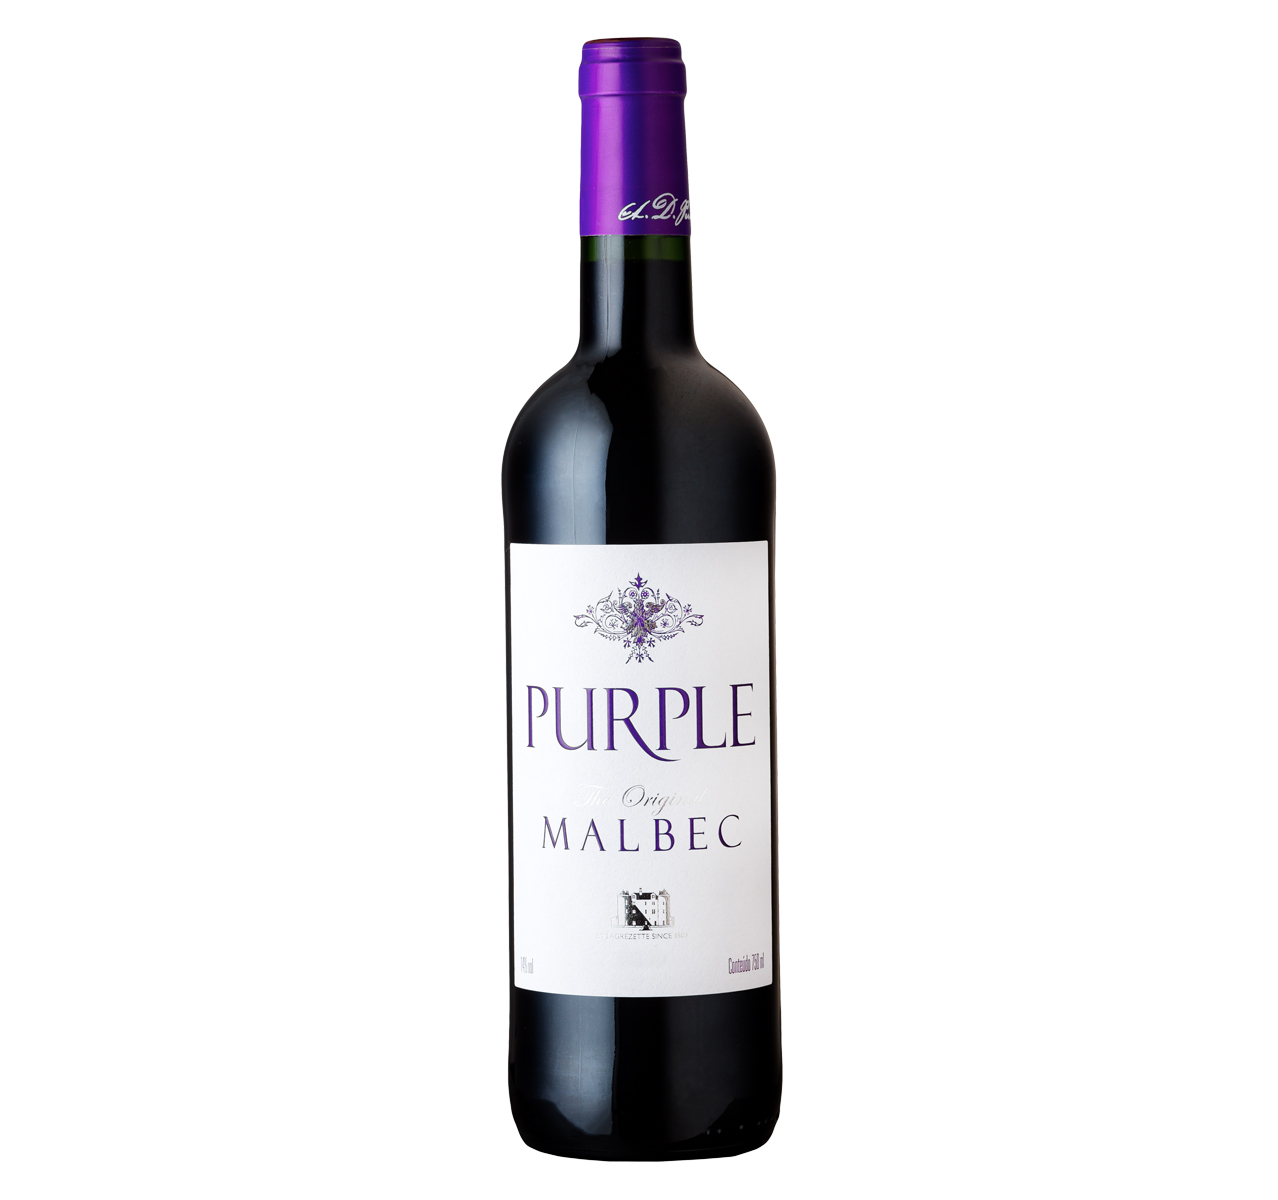 Purple Malbec